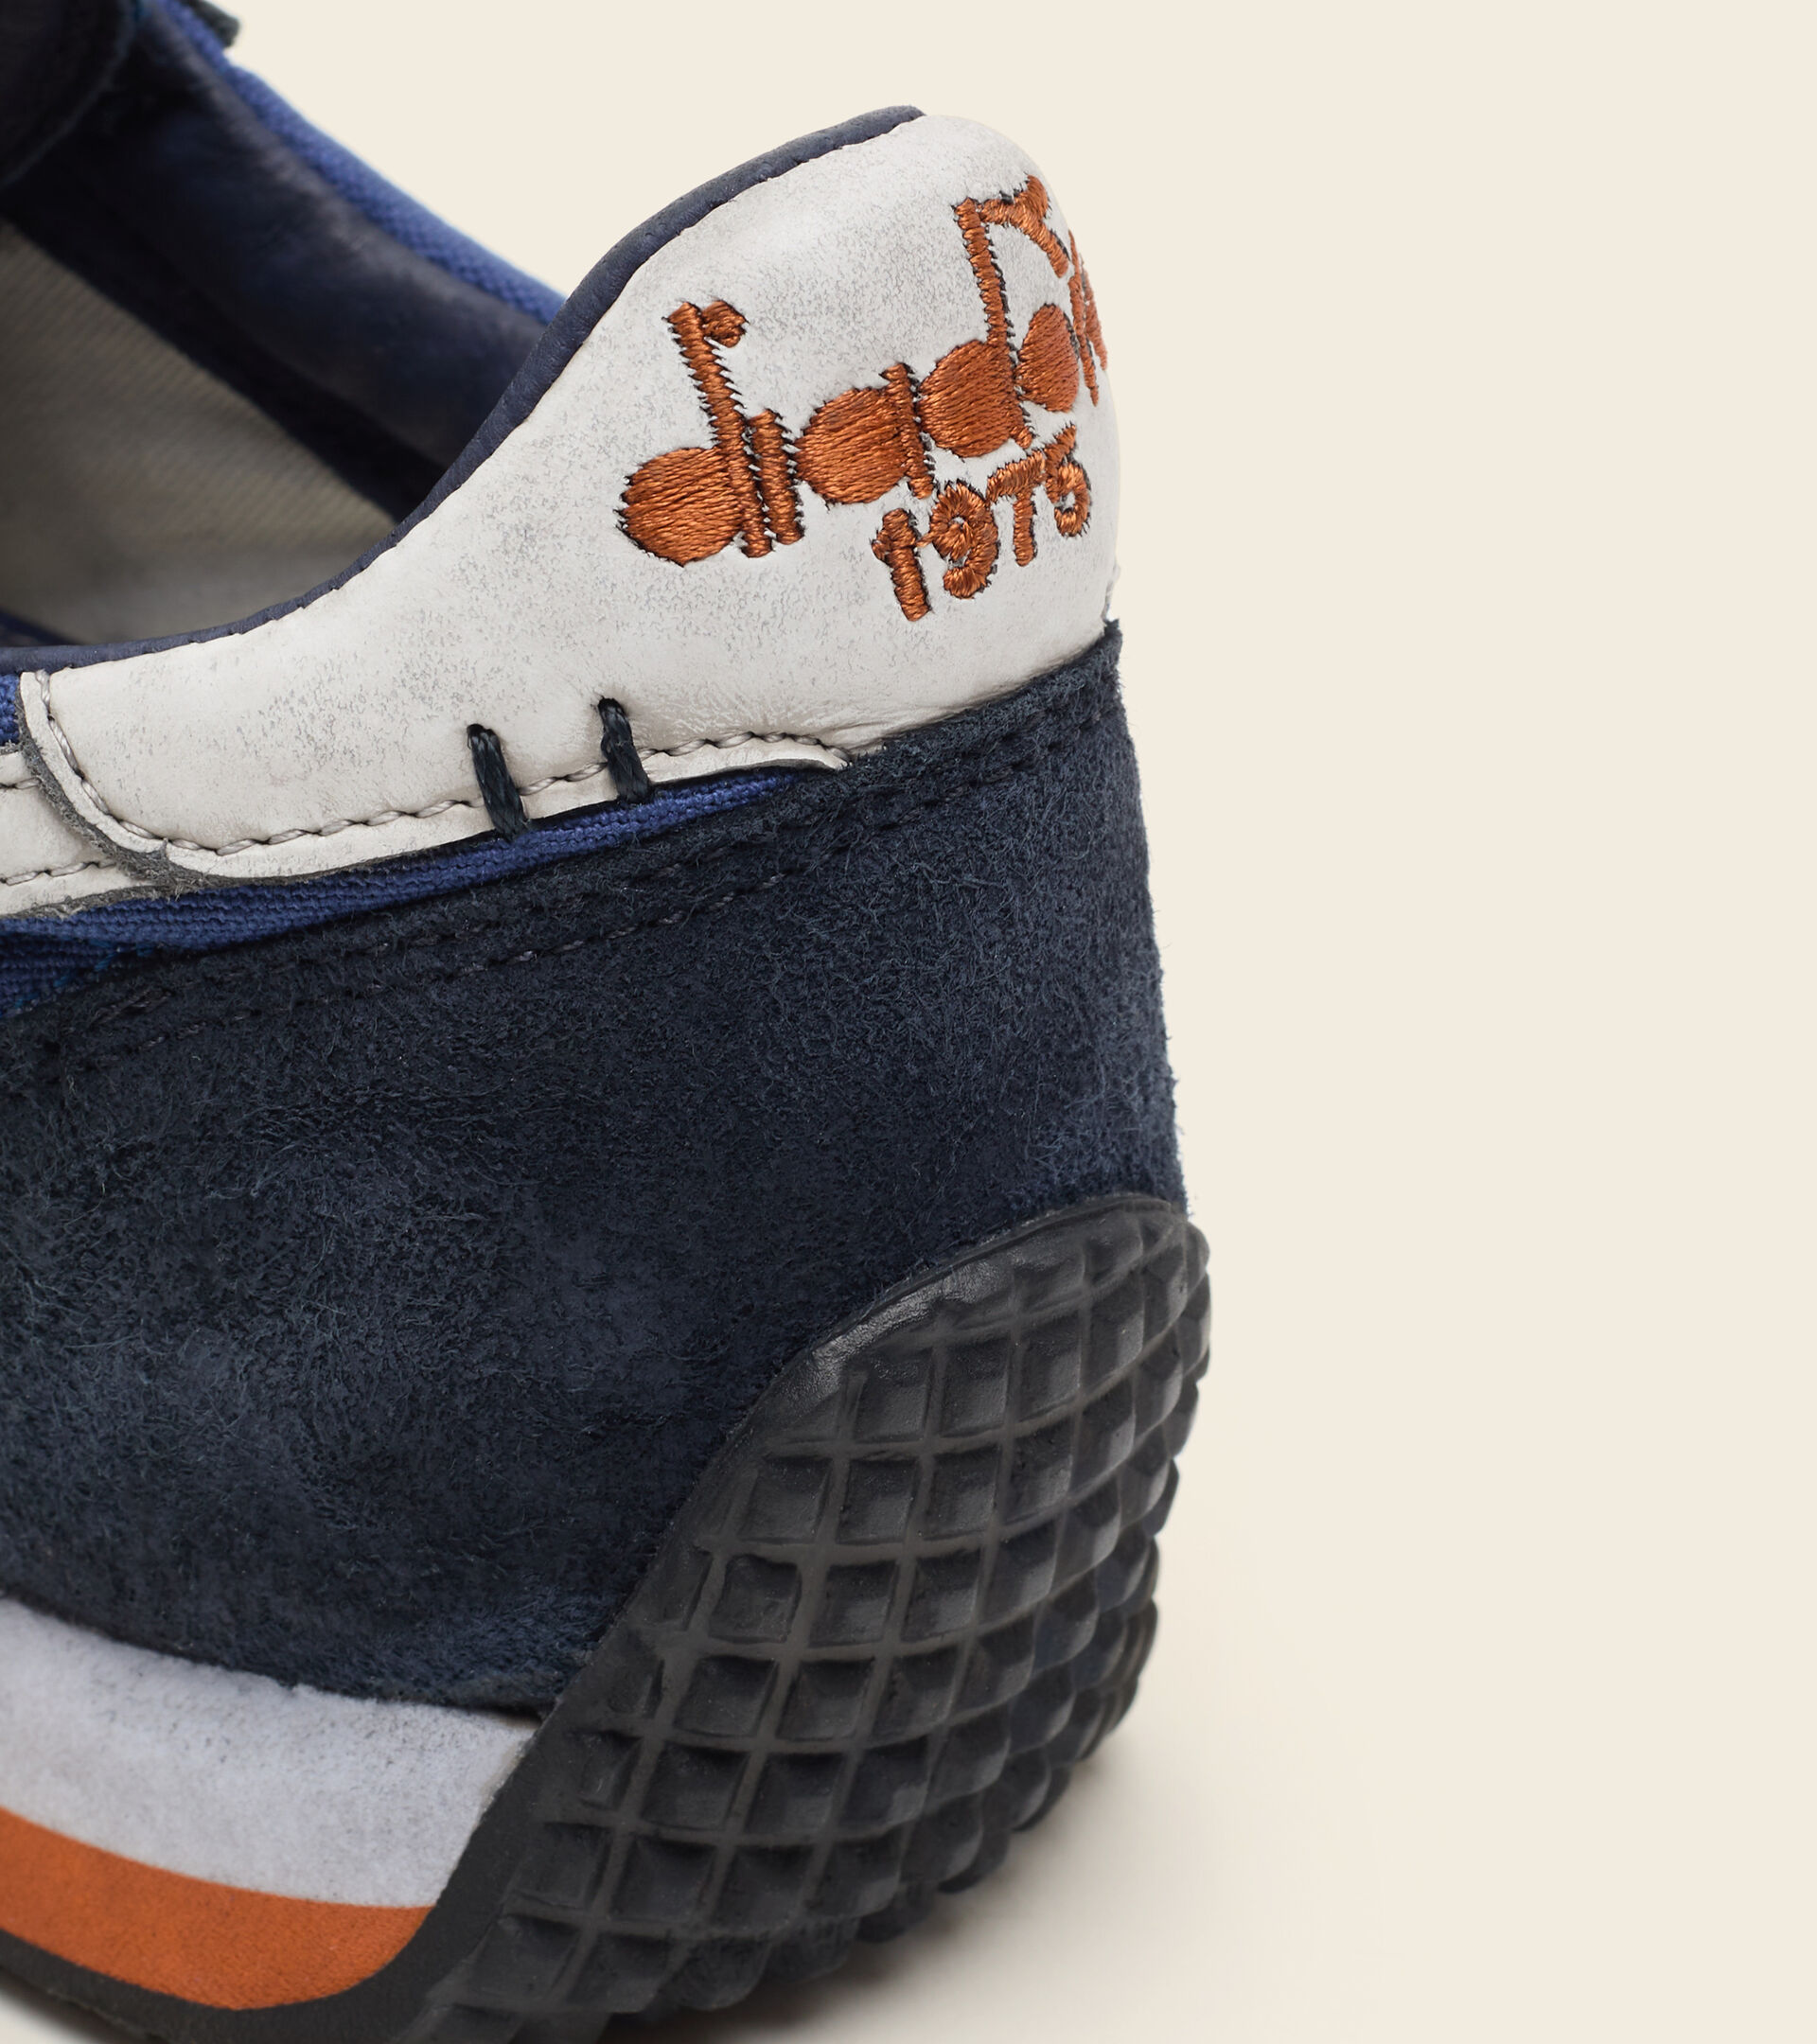 Heritage-Schuh - Unisex EQUIPE H DIRTY STONE WASH EVO LIMOSINER BLAU - Diadora